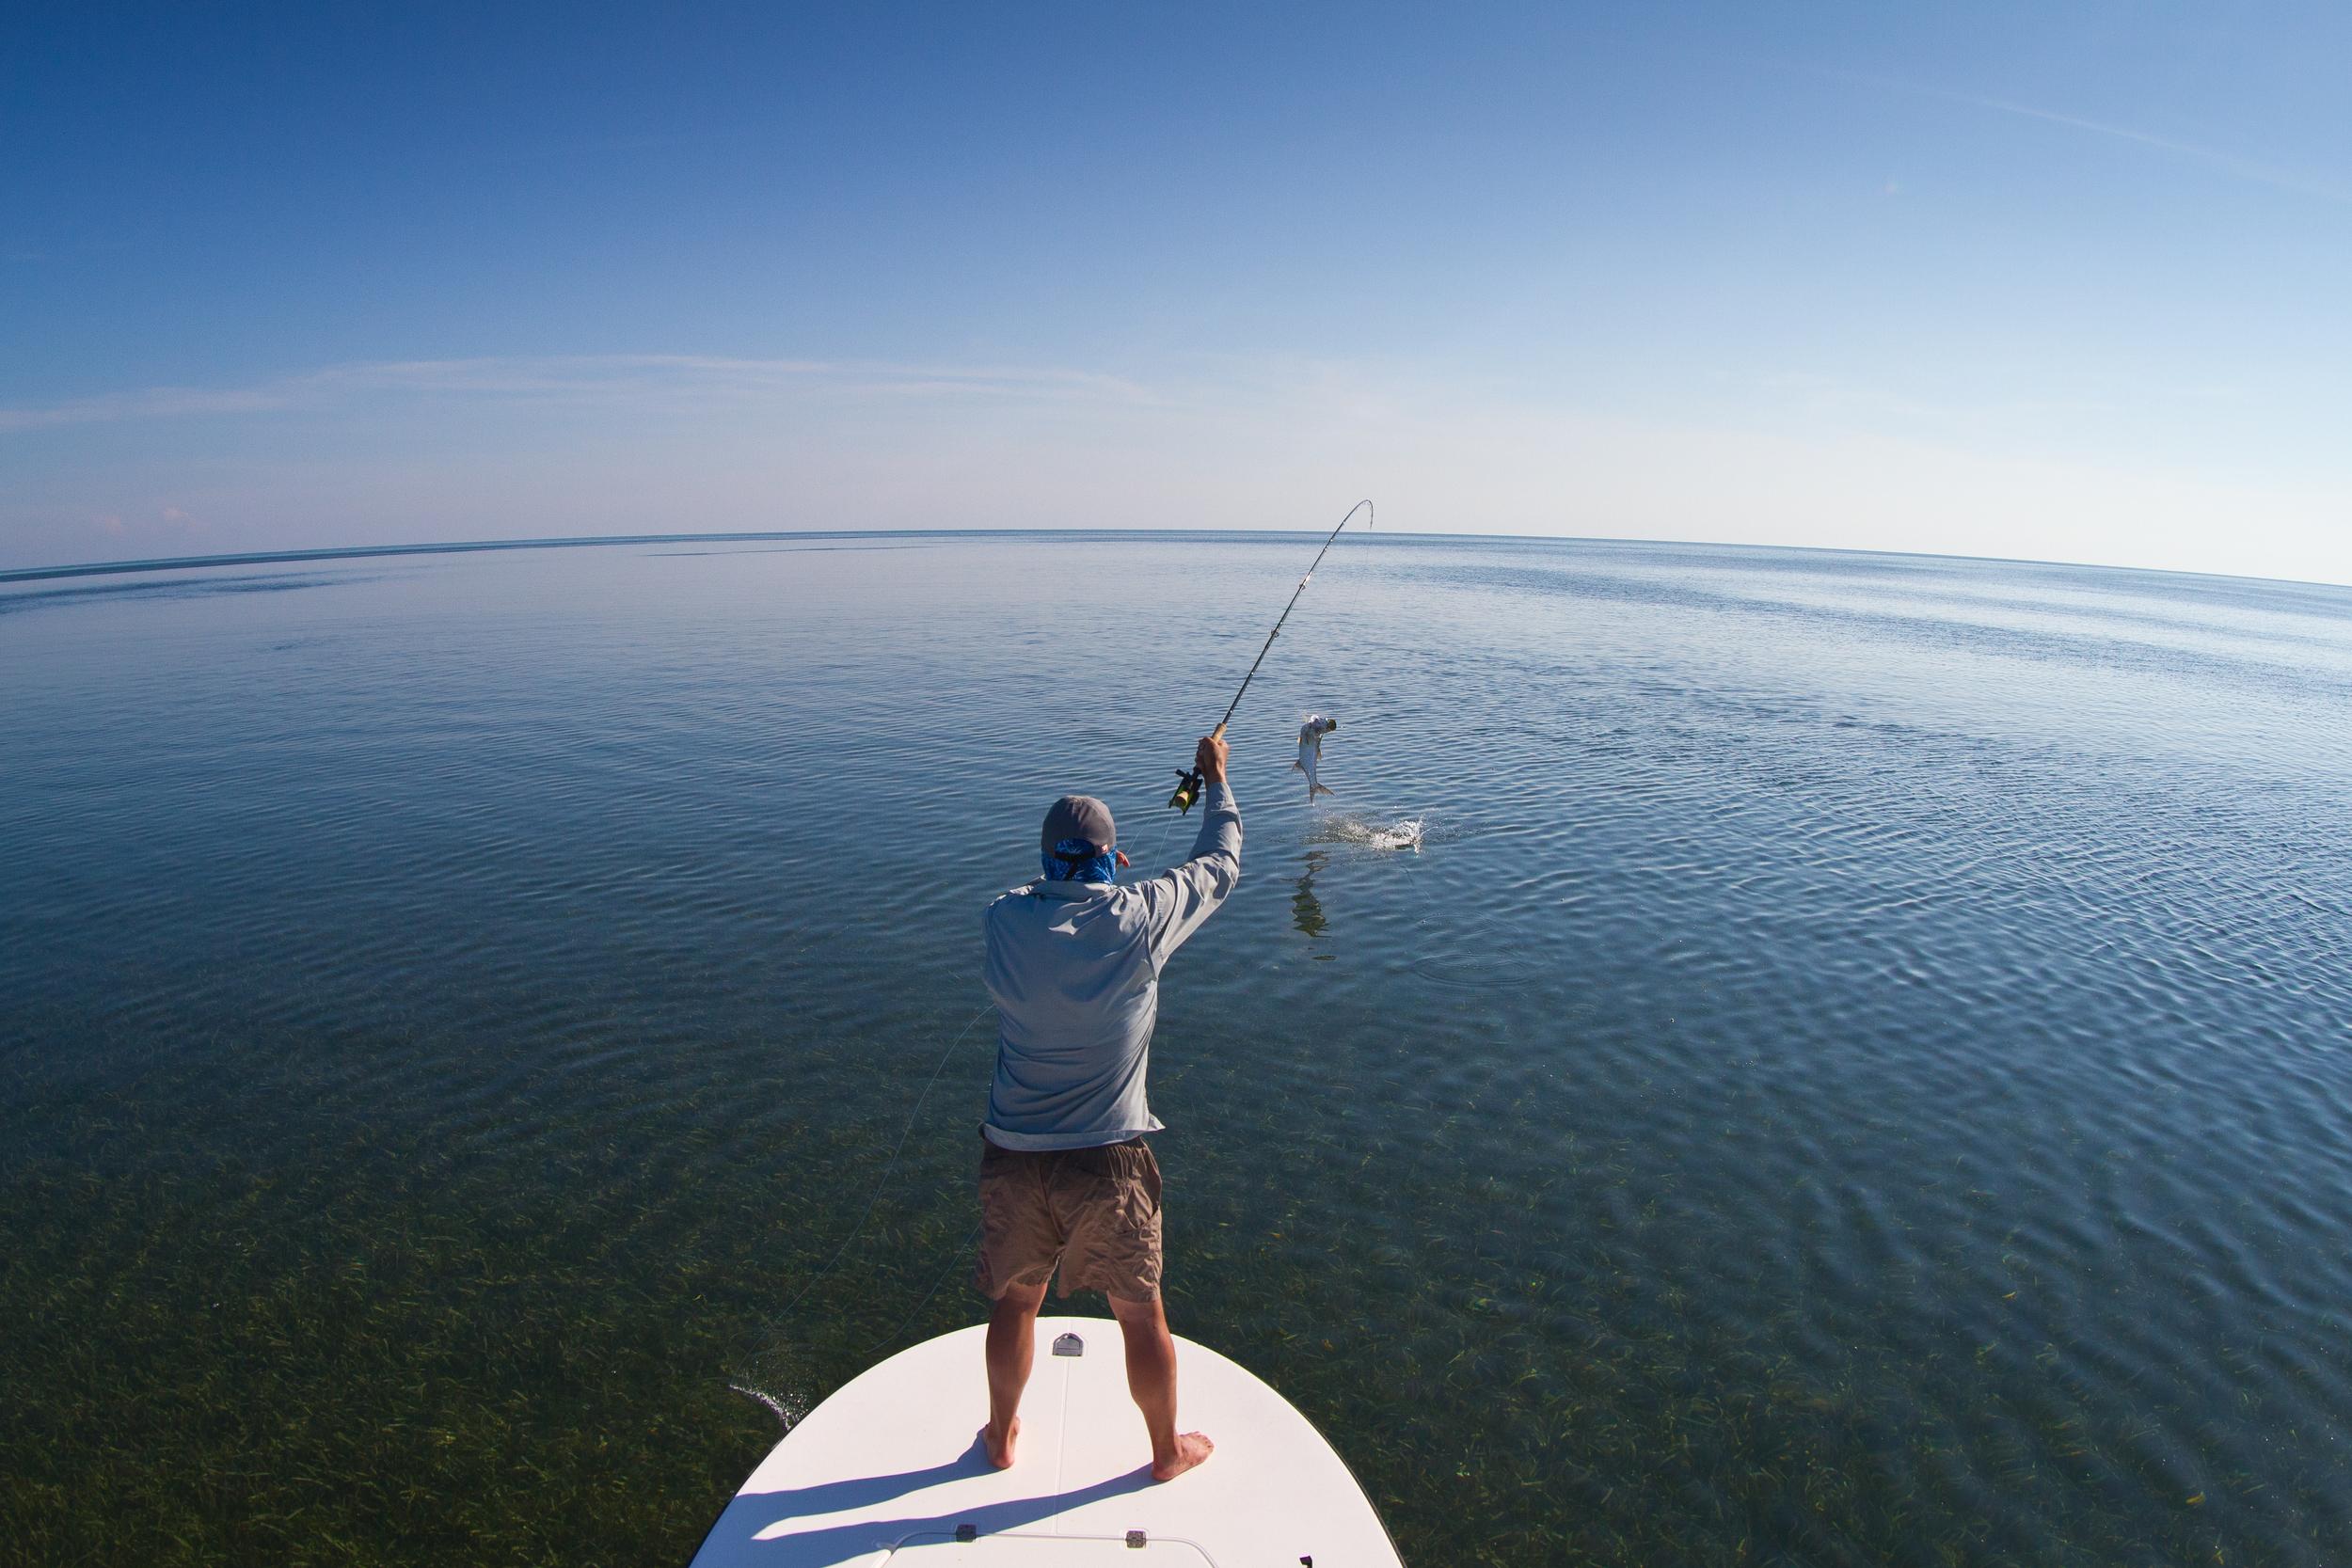 Fly Fishing for Tarpon, Jardines de la Reina, Cuba